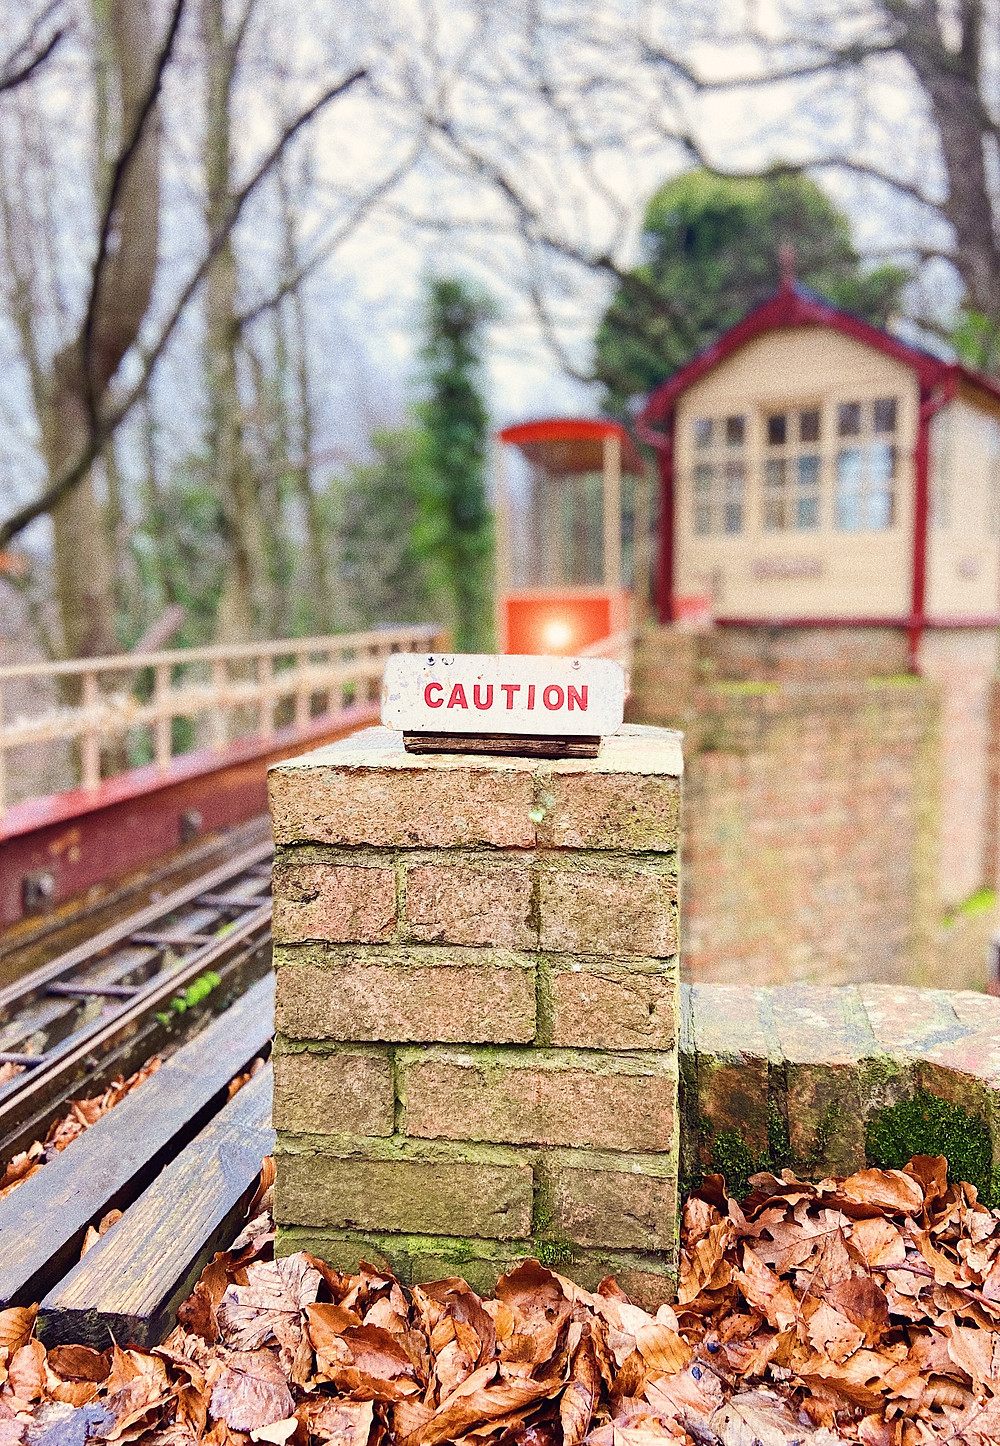 "7 1/4"" Gauge Portable Miniature Railway Hire UK - Miniature Tram 7.25"" gauge"